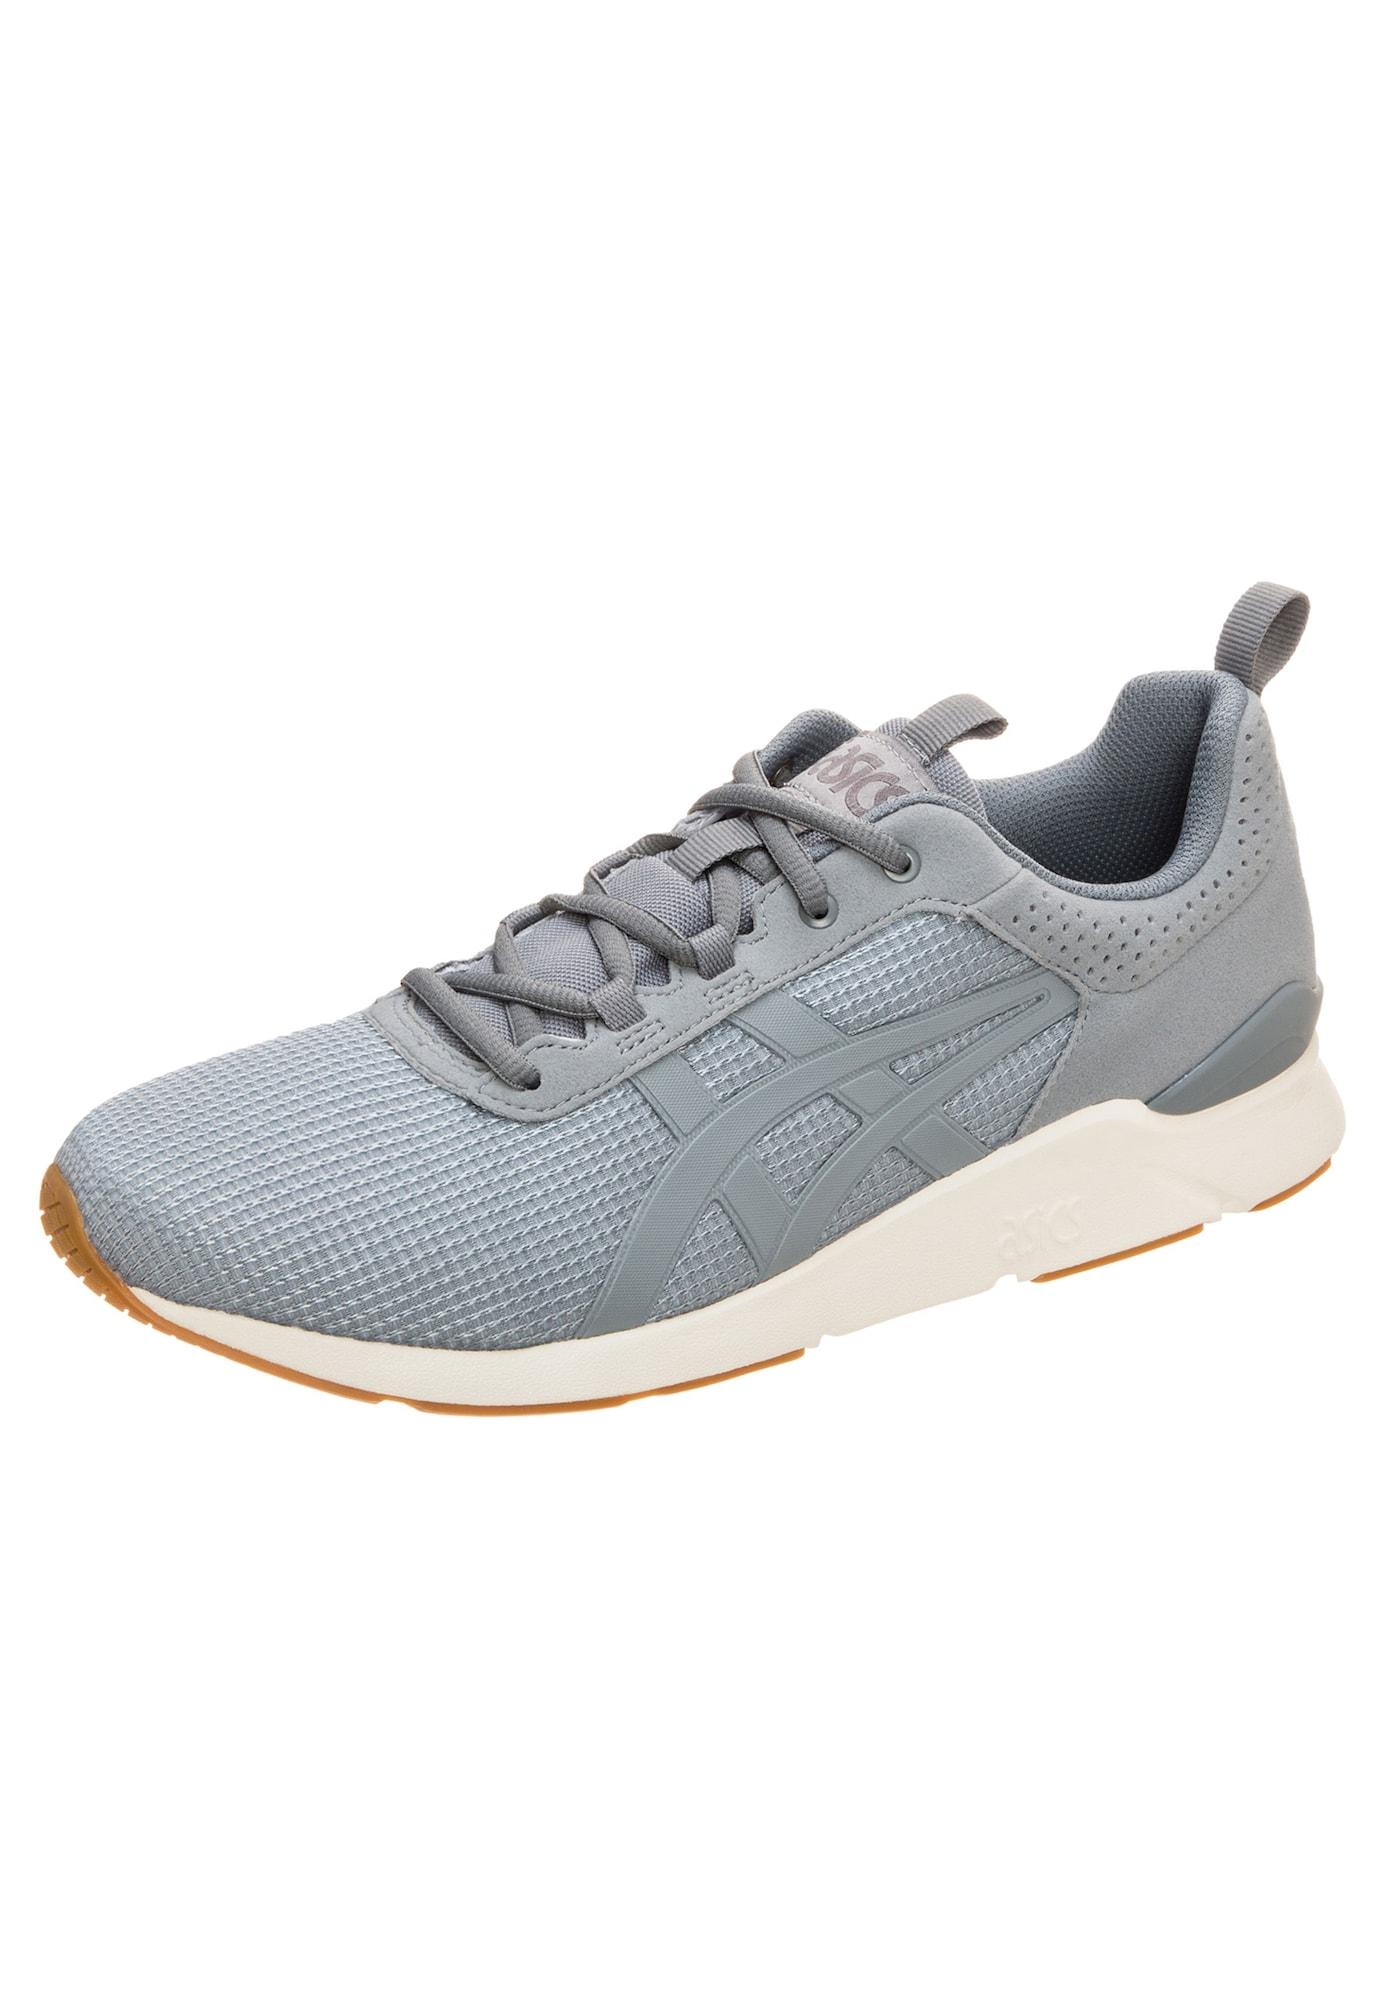 Asics Tiger, Heren Sneakers laag 'Gel-Lyte Runner', grijs / wit